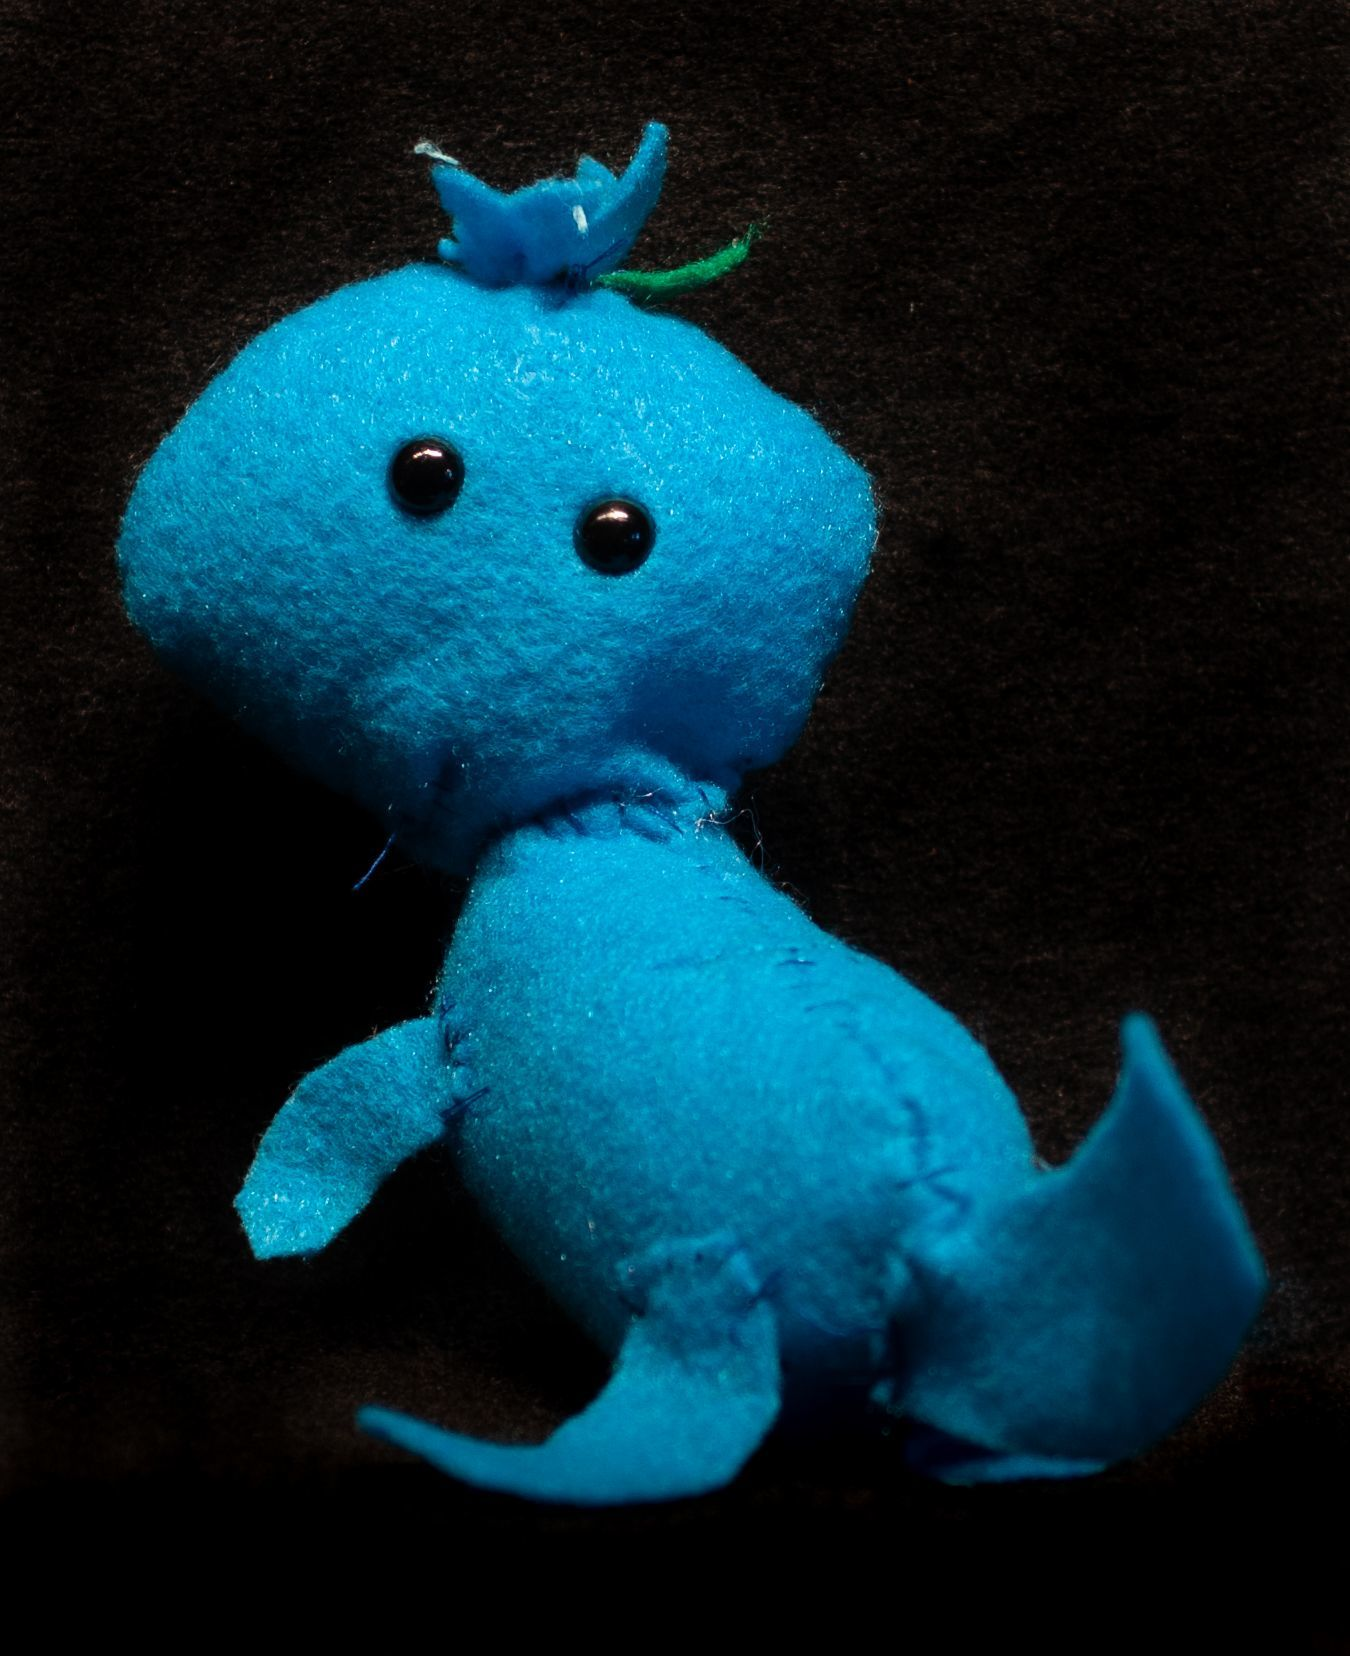 """Blueberrysaurous Rex"" - Cora Belle Mitchell"